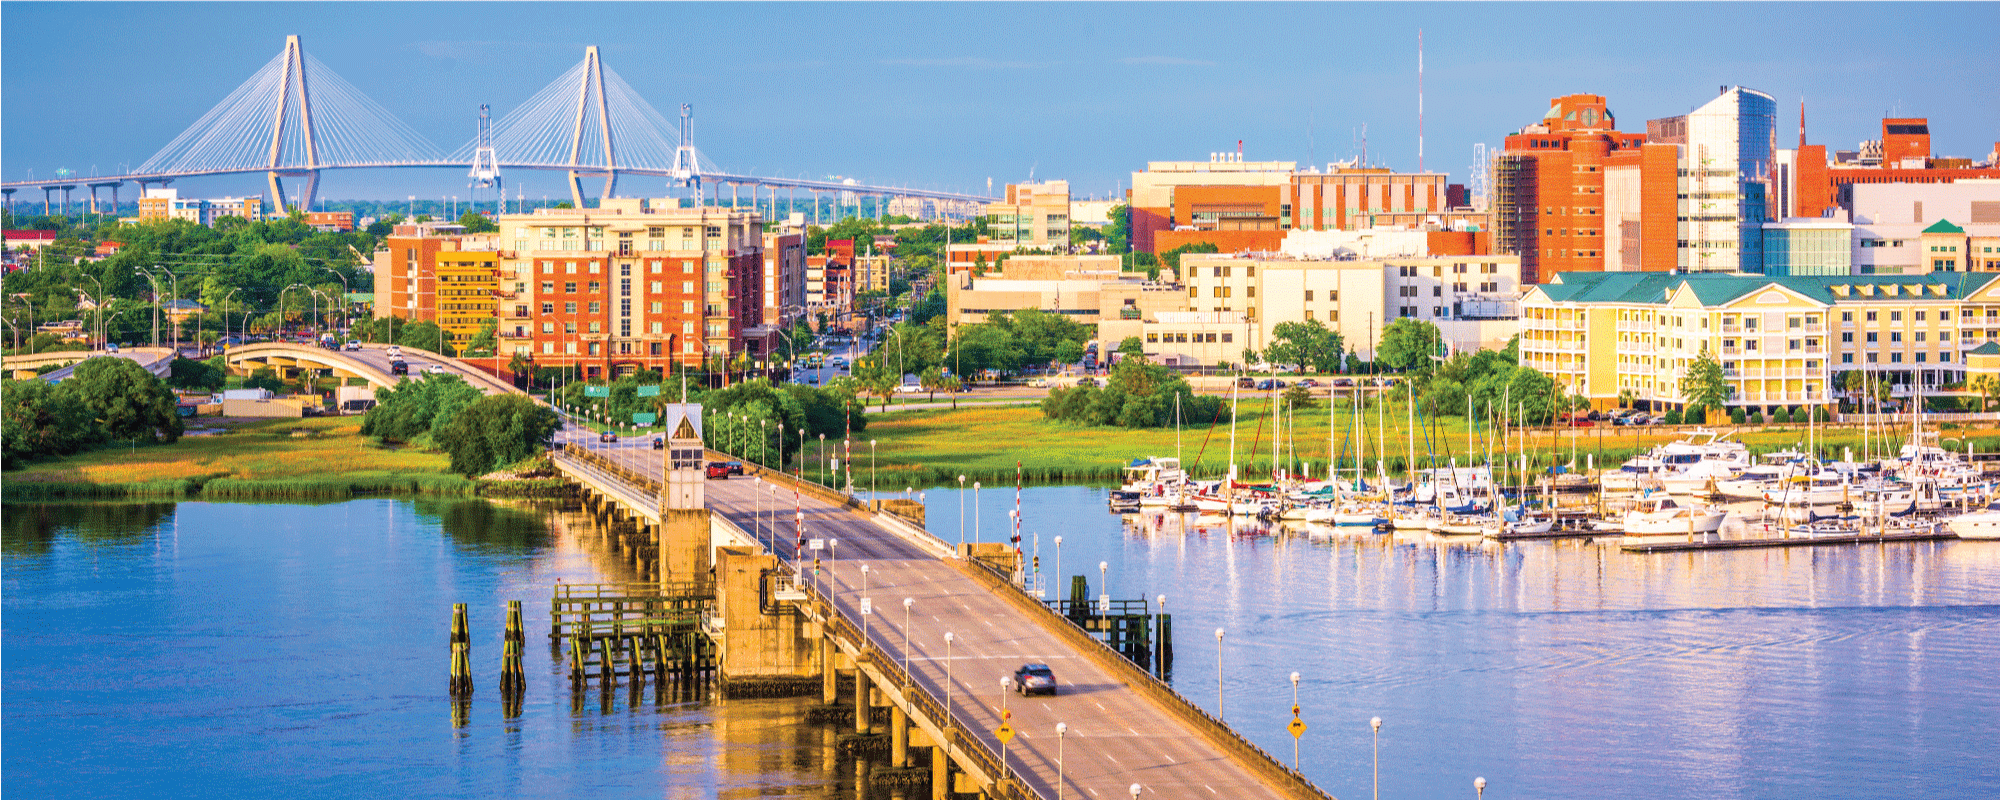 Charleston 1144281172.png